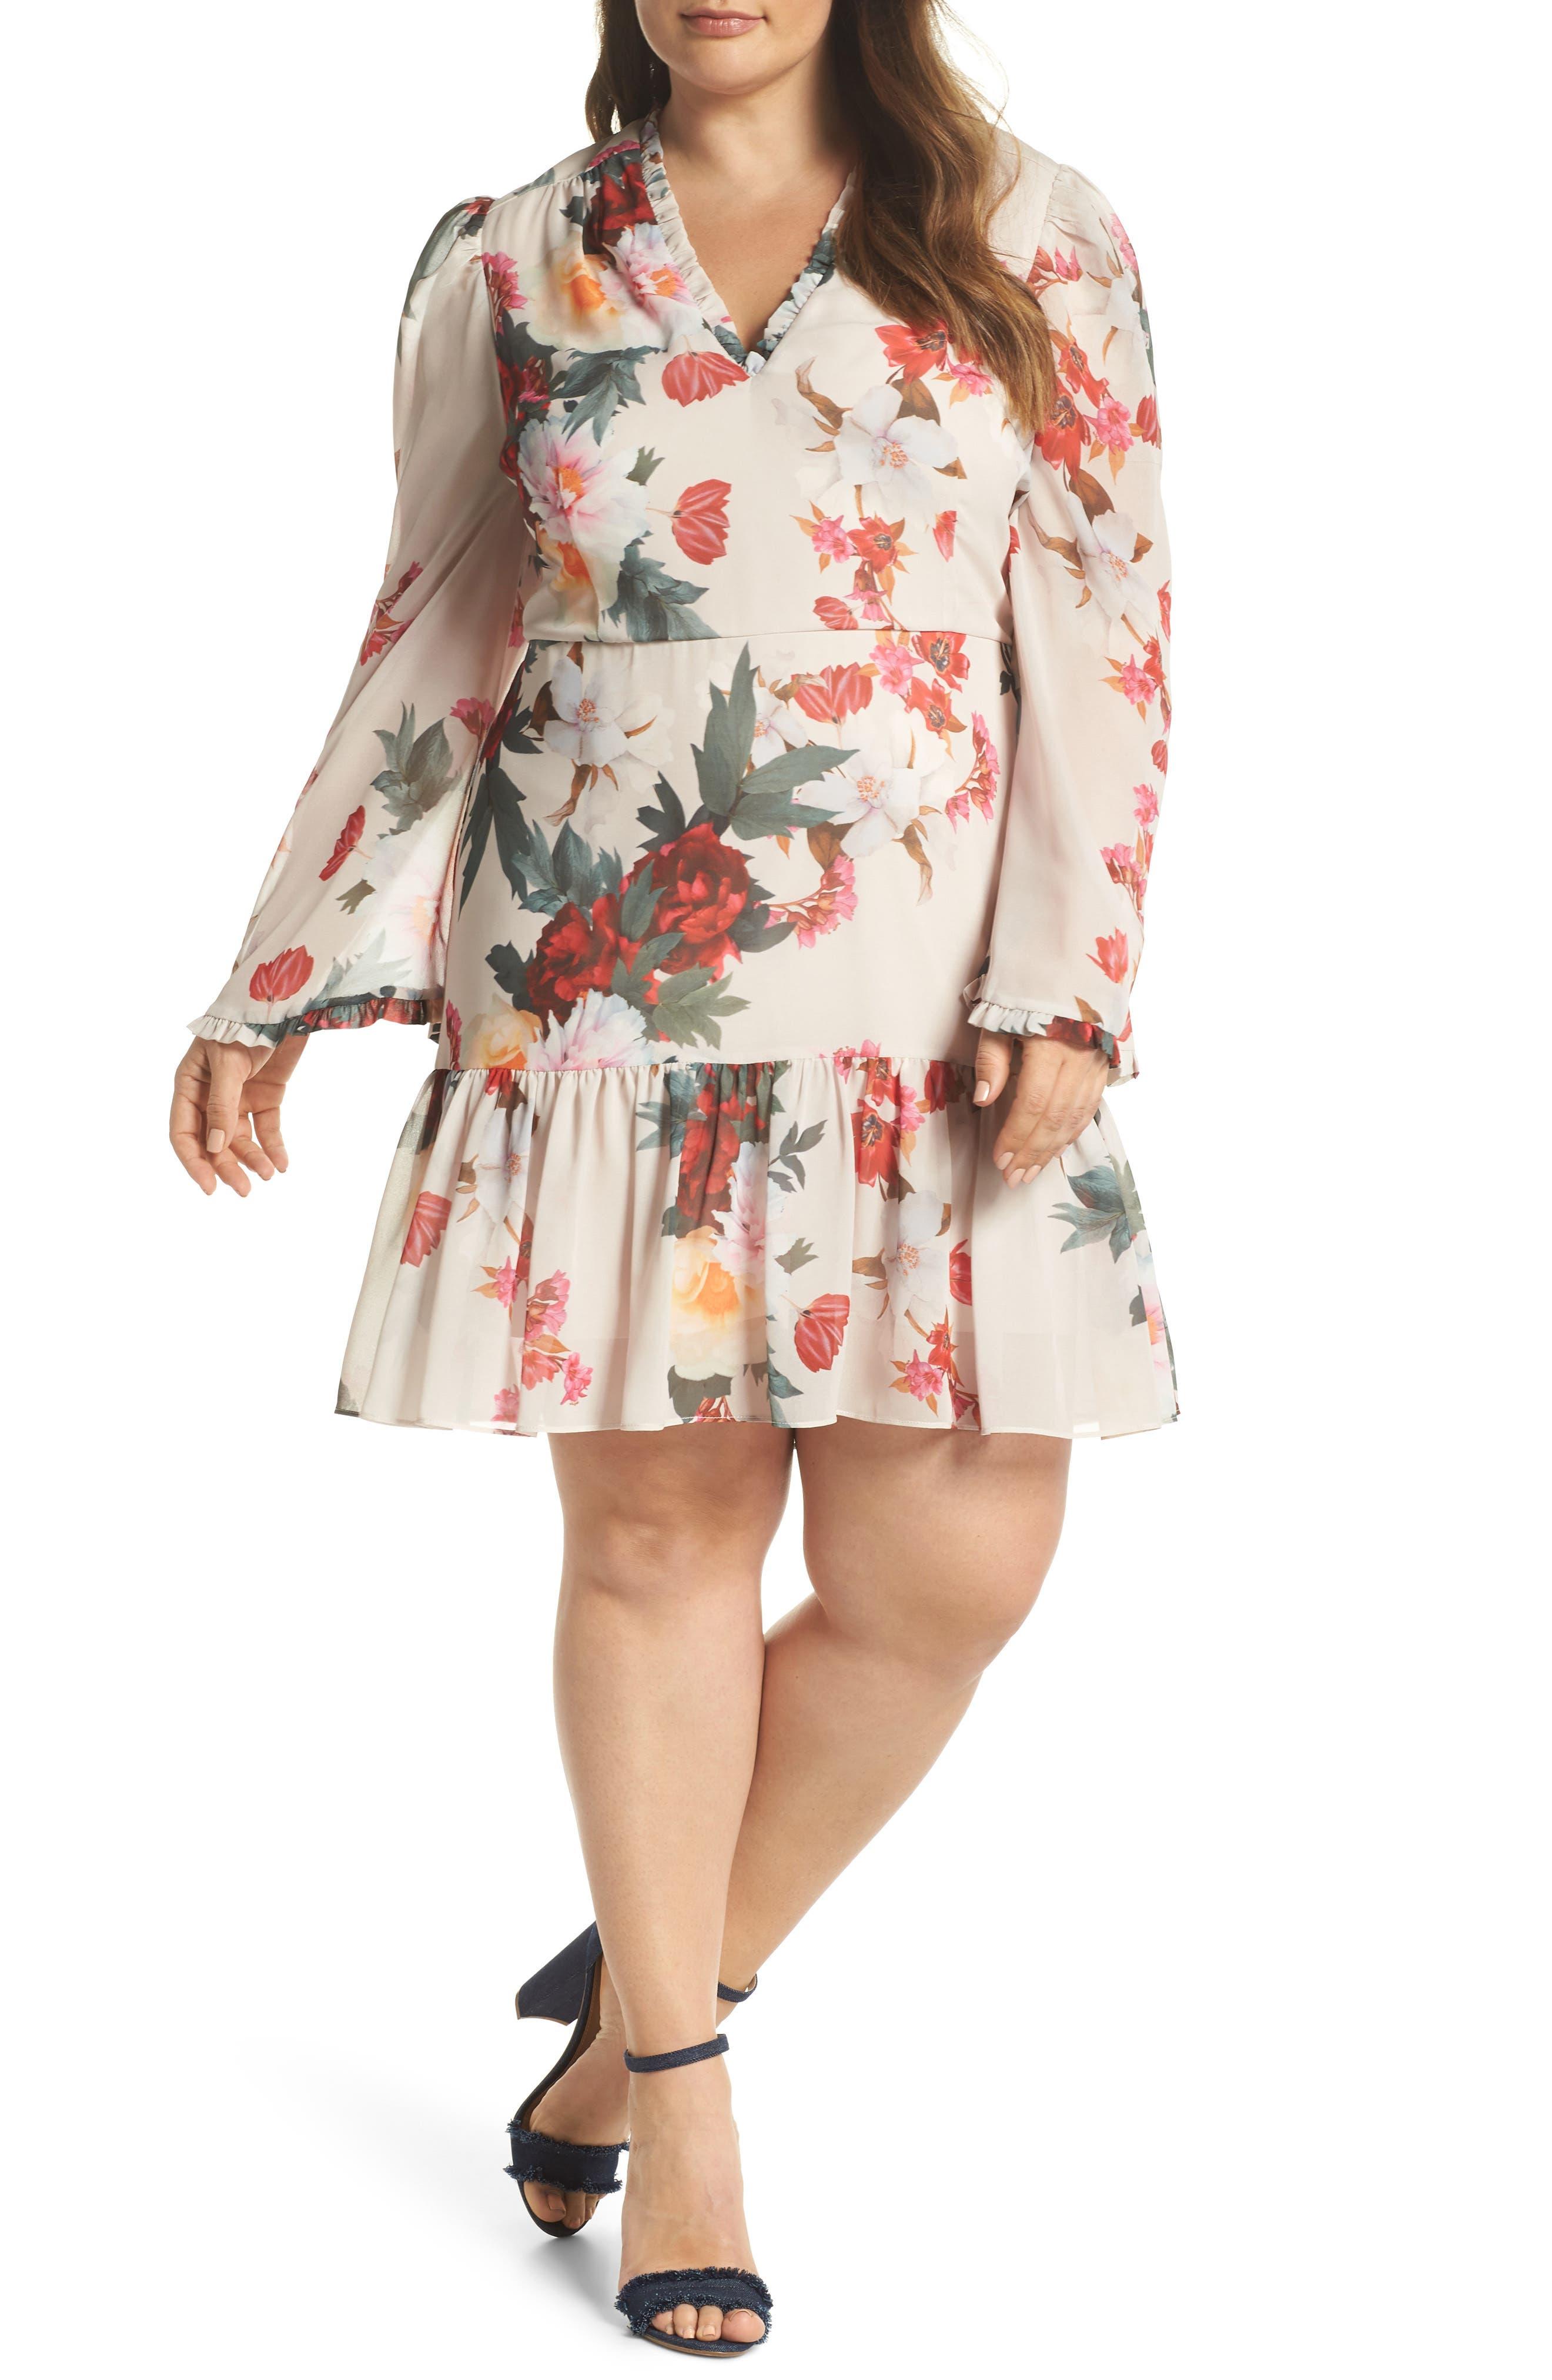 Cooper St Rosa Floral Chiffon Minidress (Plus Size)